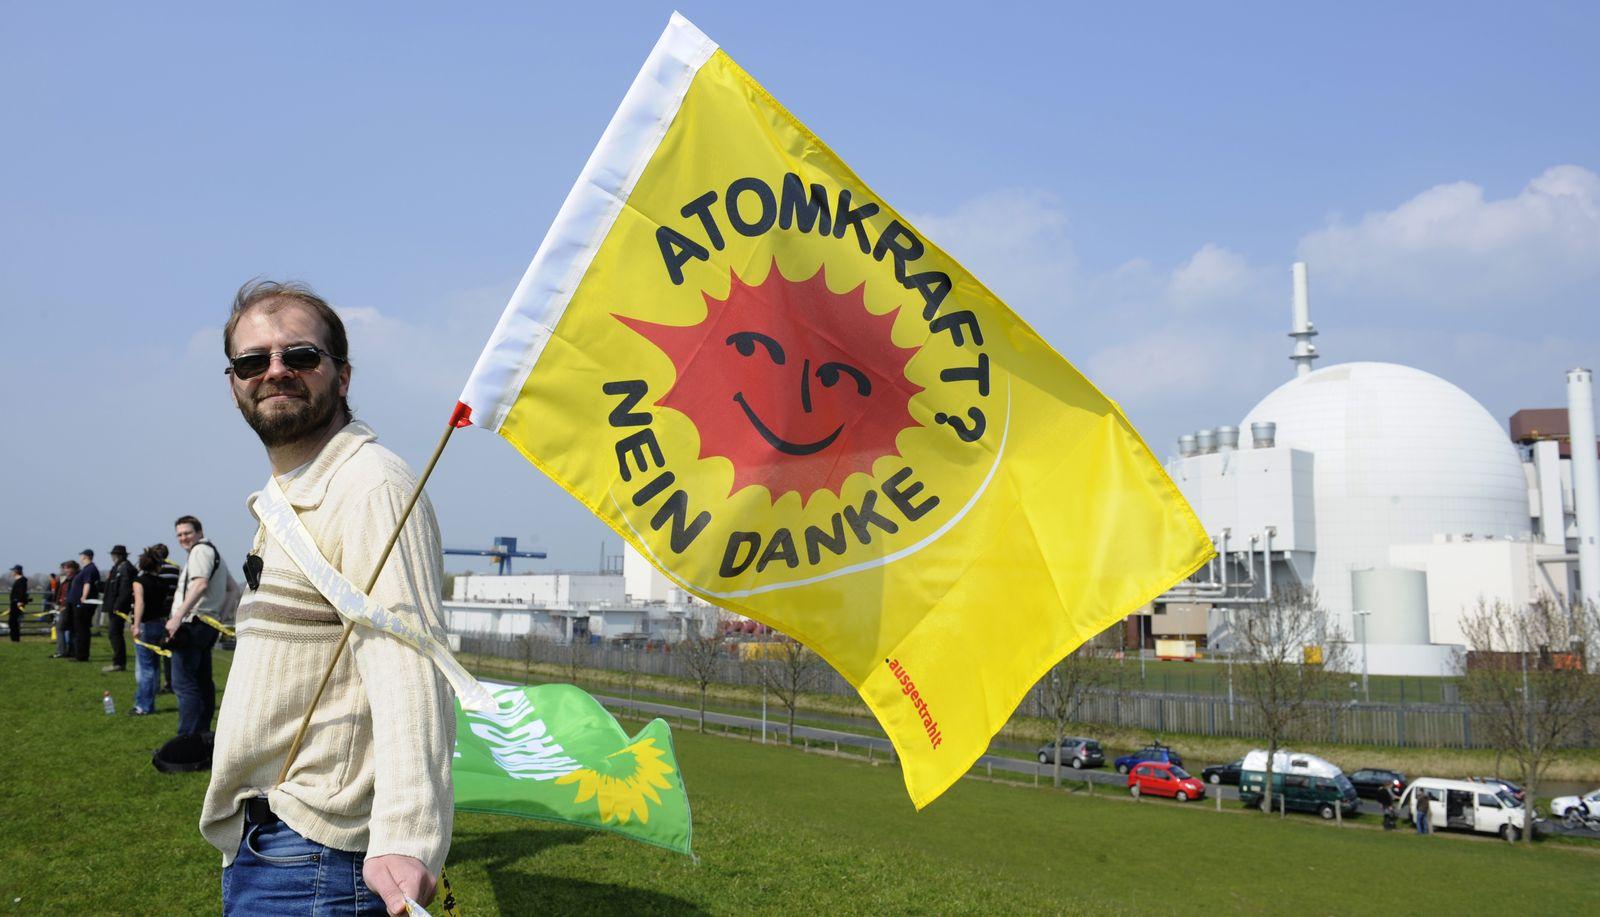 AKW Brokdorf / Atomkraft nein danke